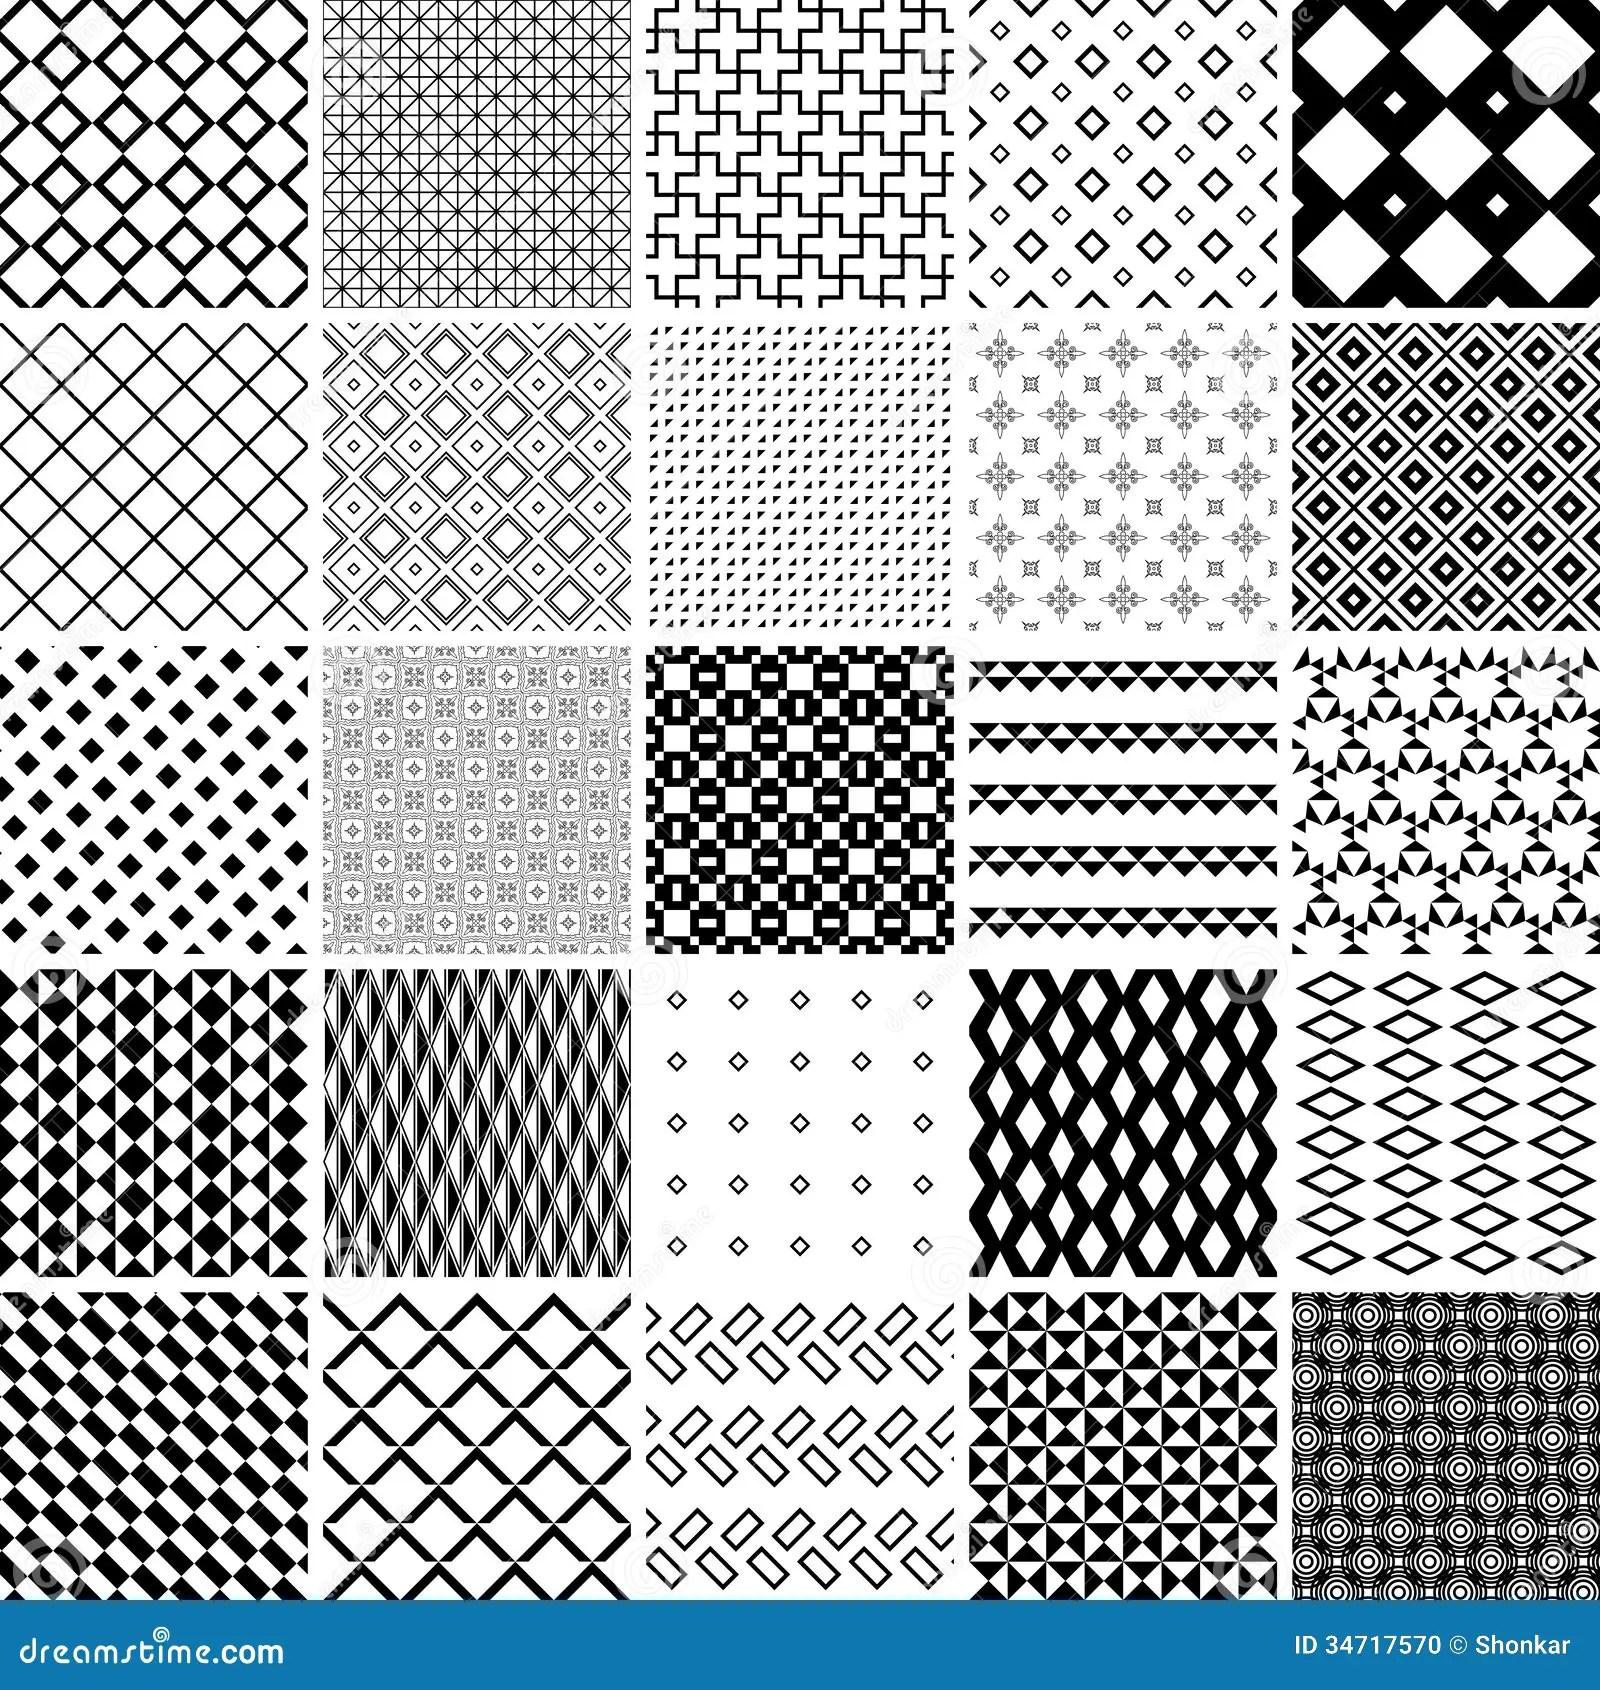 Black White Square Wallpaper Seamless Pattern Stock Photo Image 34717570